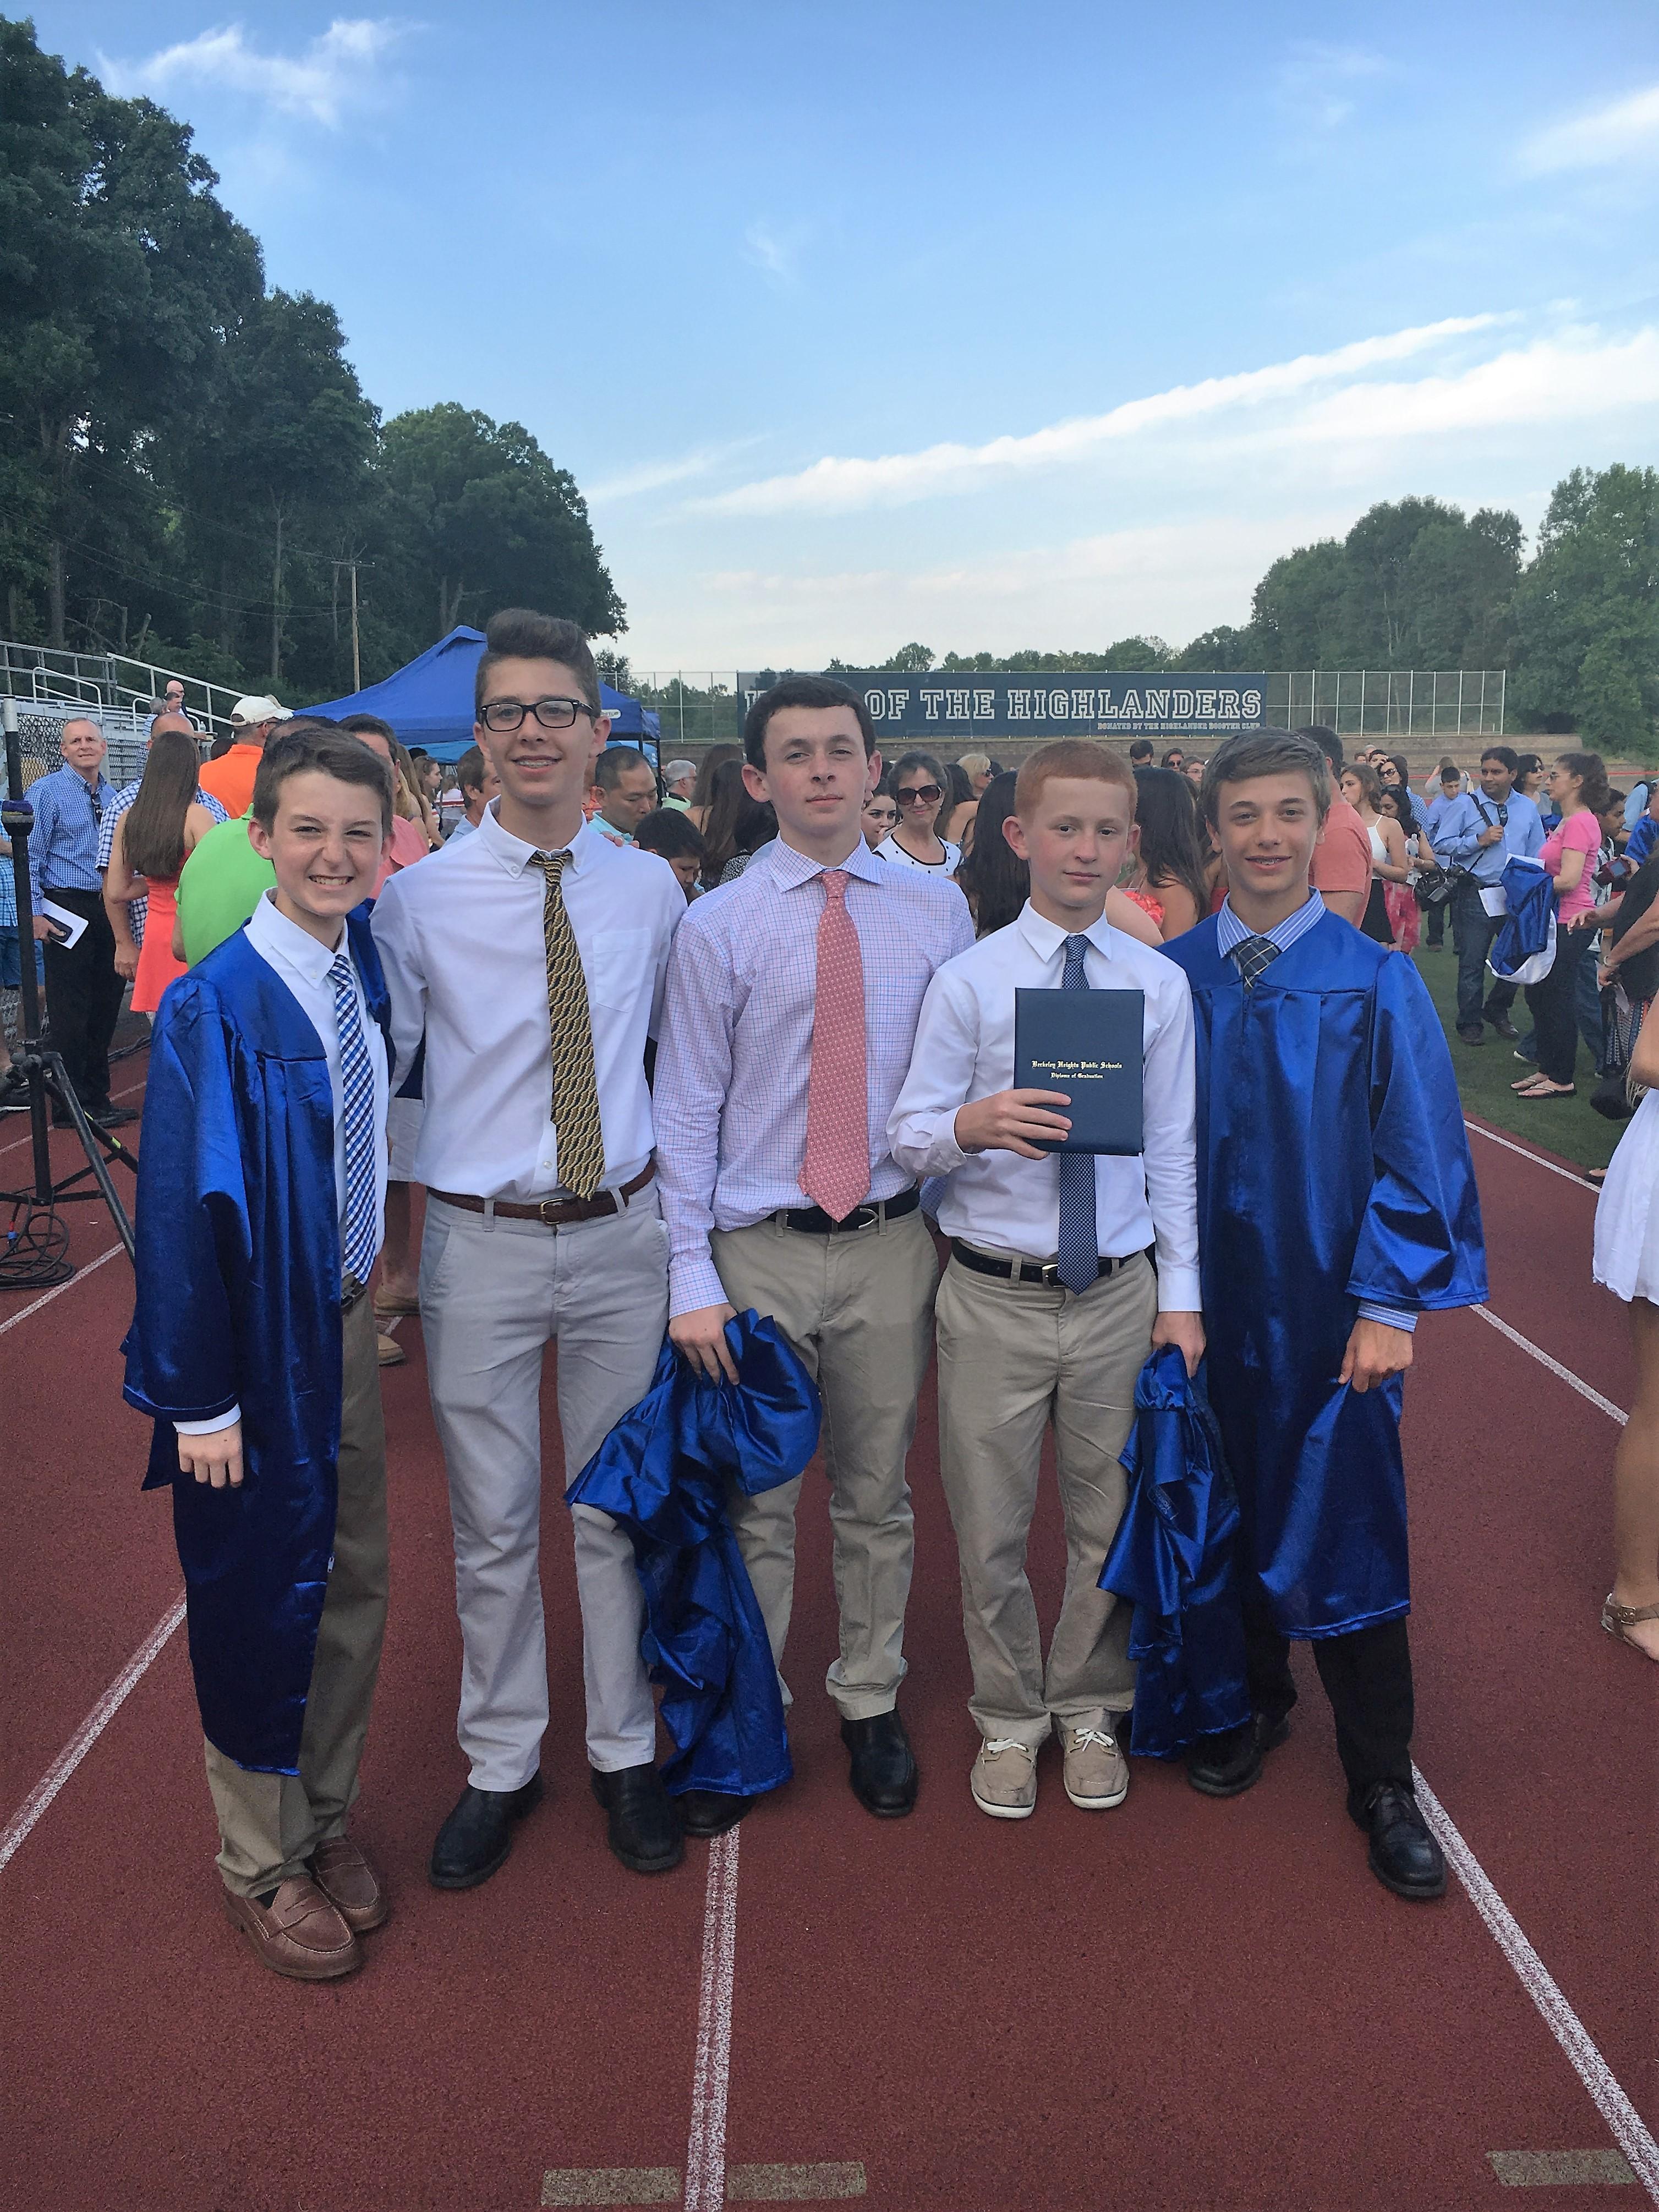 Columbia Middle School Graduates Eighth Grade Class of ...